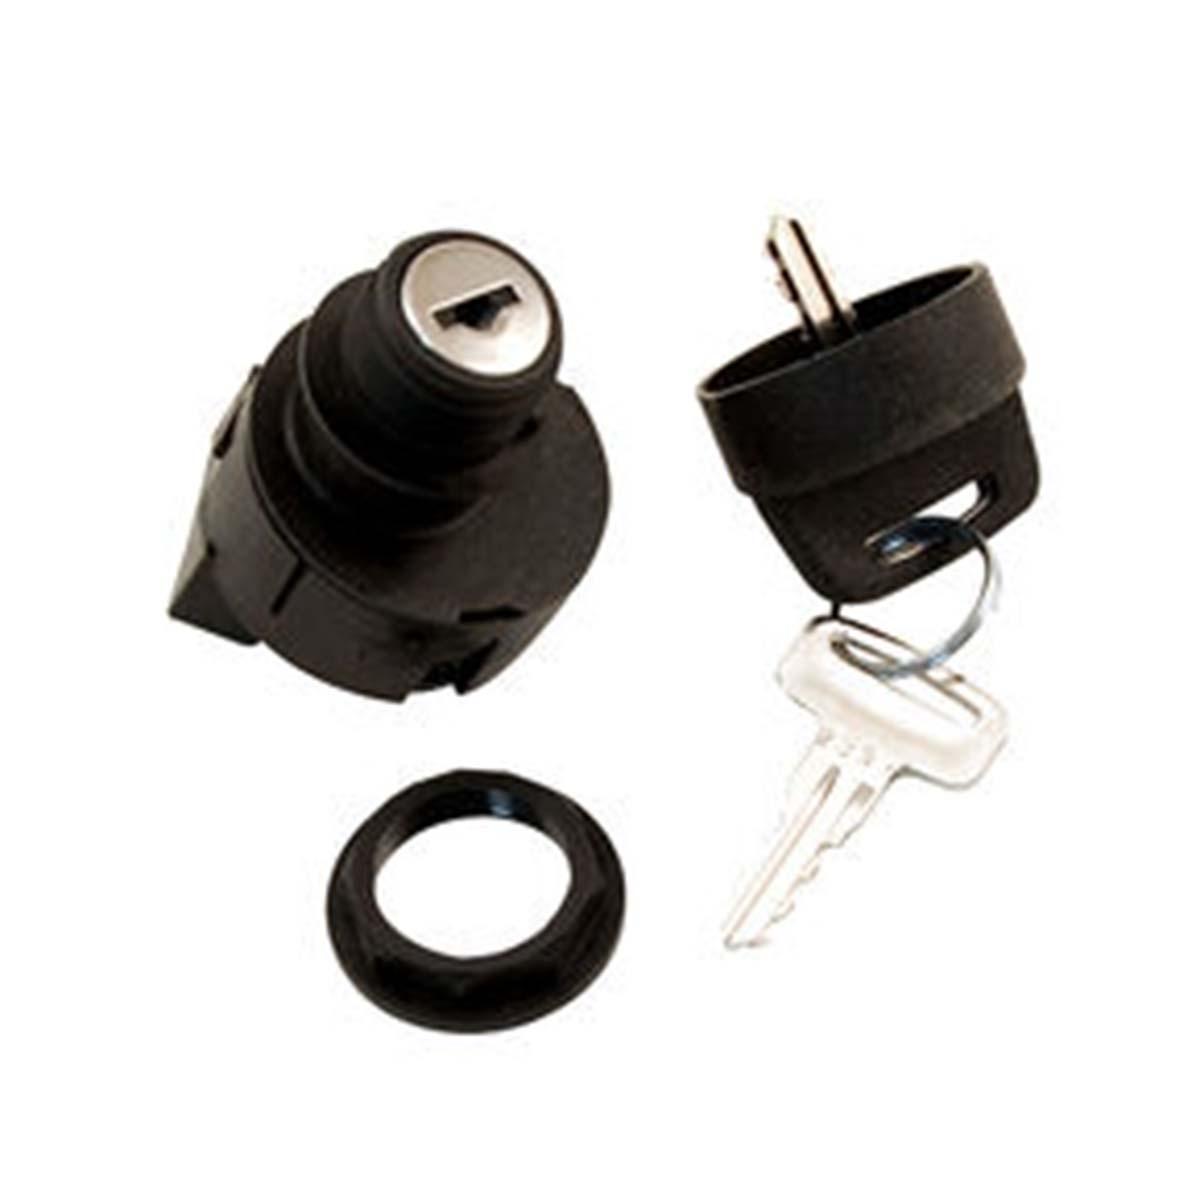 100 Cub Wiring Diagram Cub Cadet Ignition Switch 925 3277 Power Mower Sales